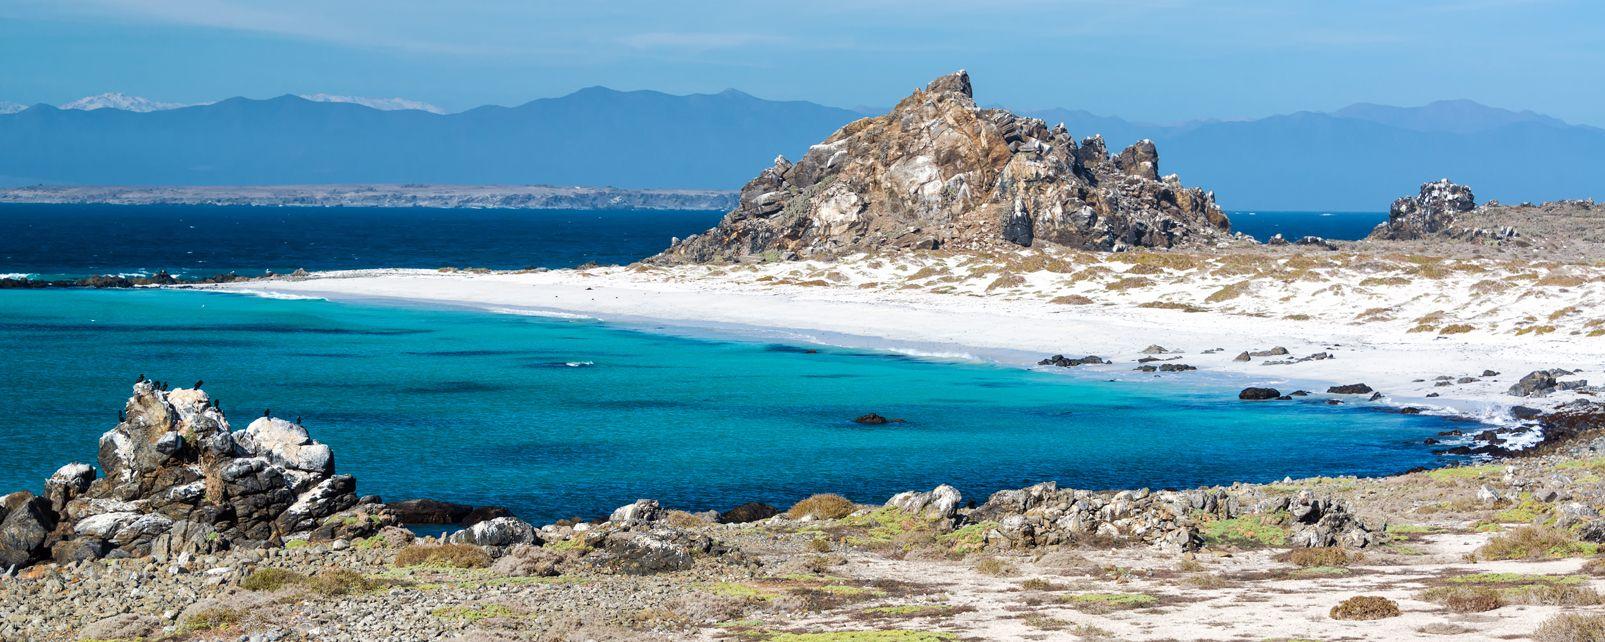 , La Serena, Coasts, Chile